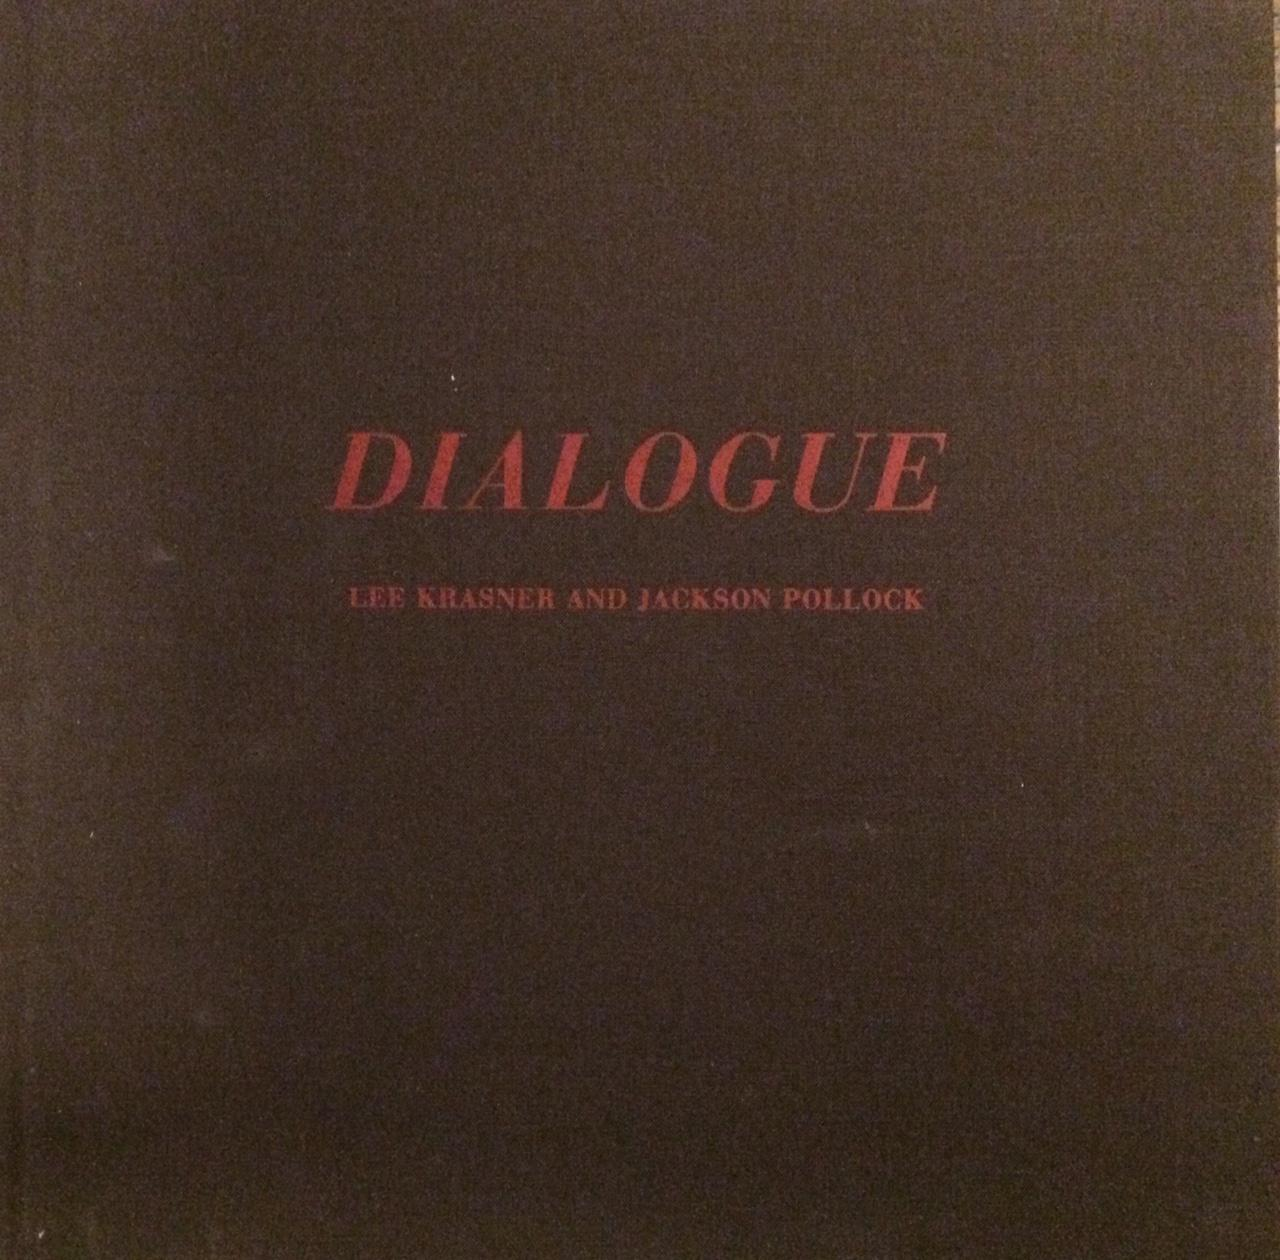 Dialogue: Lee Krasner and Jackson Pollock - Rose, Barbara